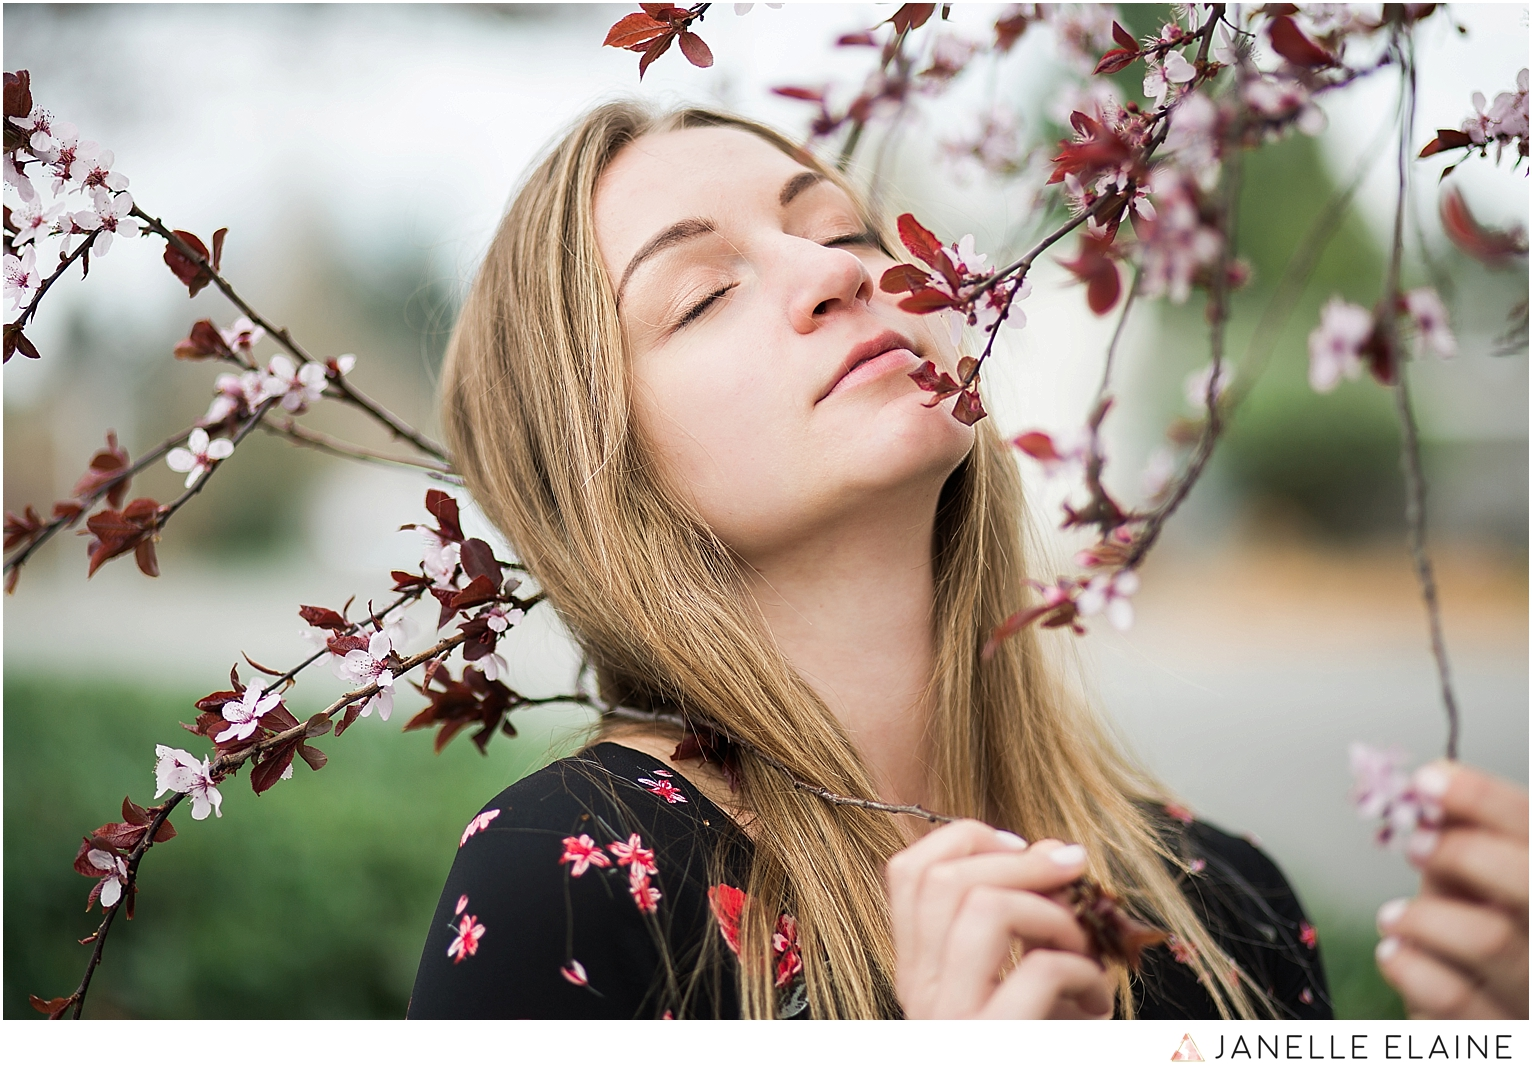 kirsi-renton wa portrait sesssion-cherry blossom-h&m dress-seattle photographer janelle elaine photography-26.jpg